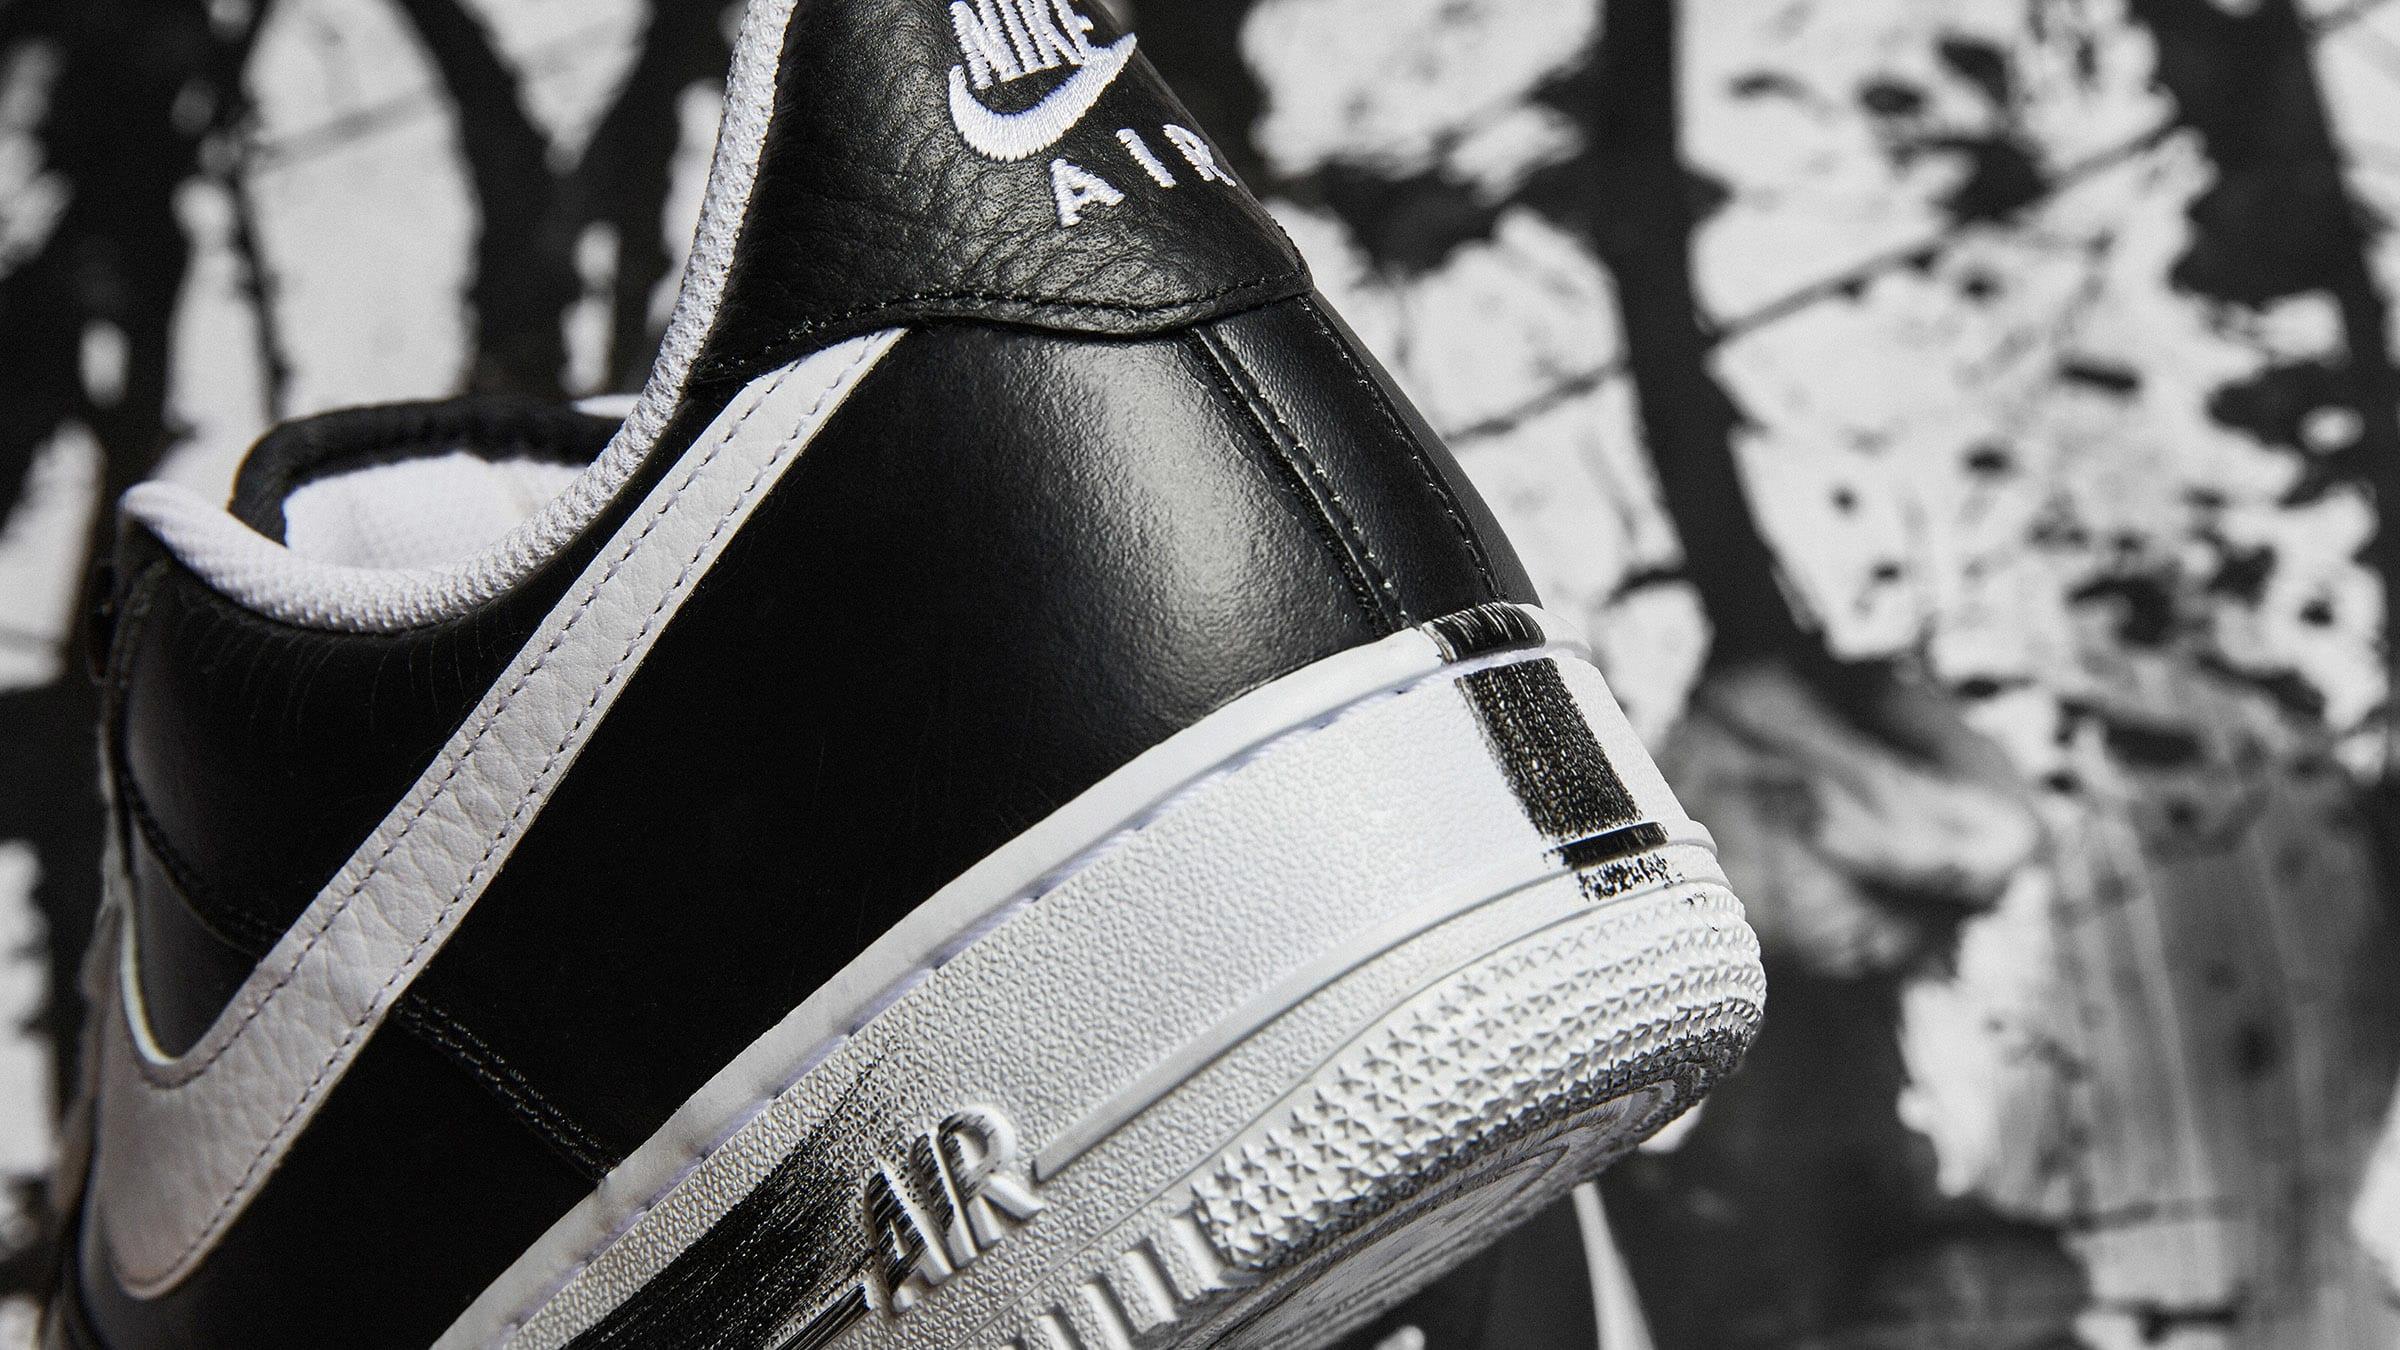 Peaceminusone x Nike Air Force 1 Low - aq3692-001